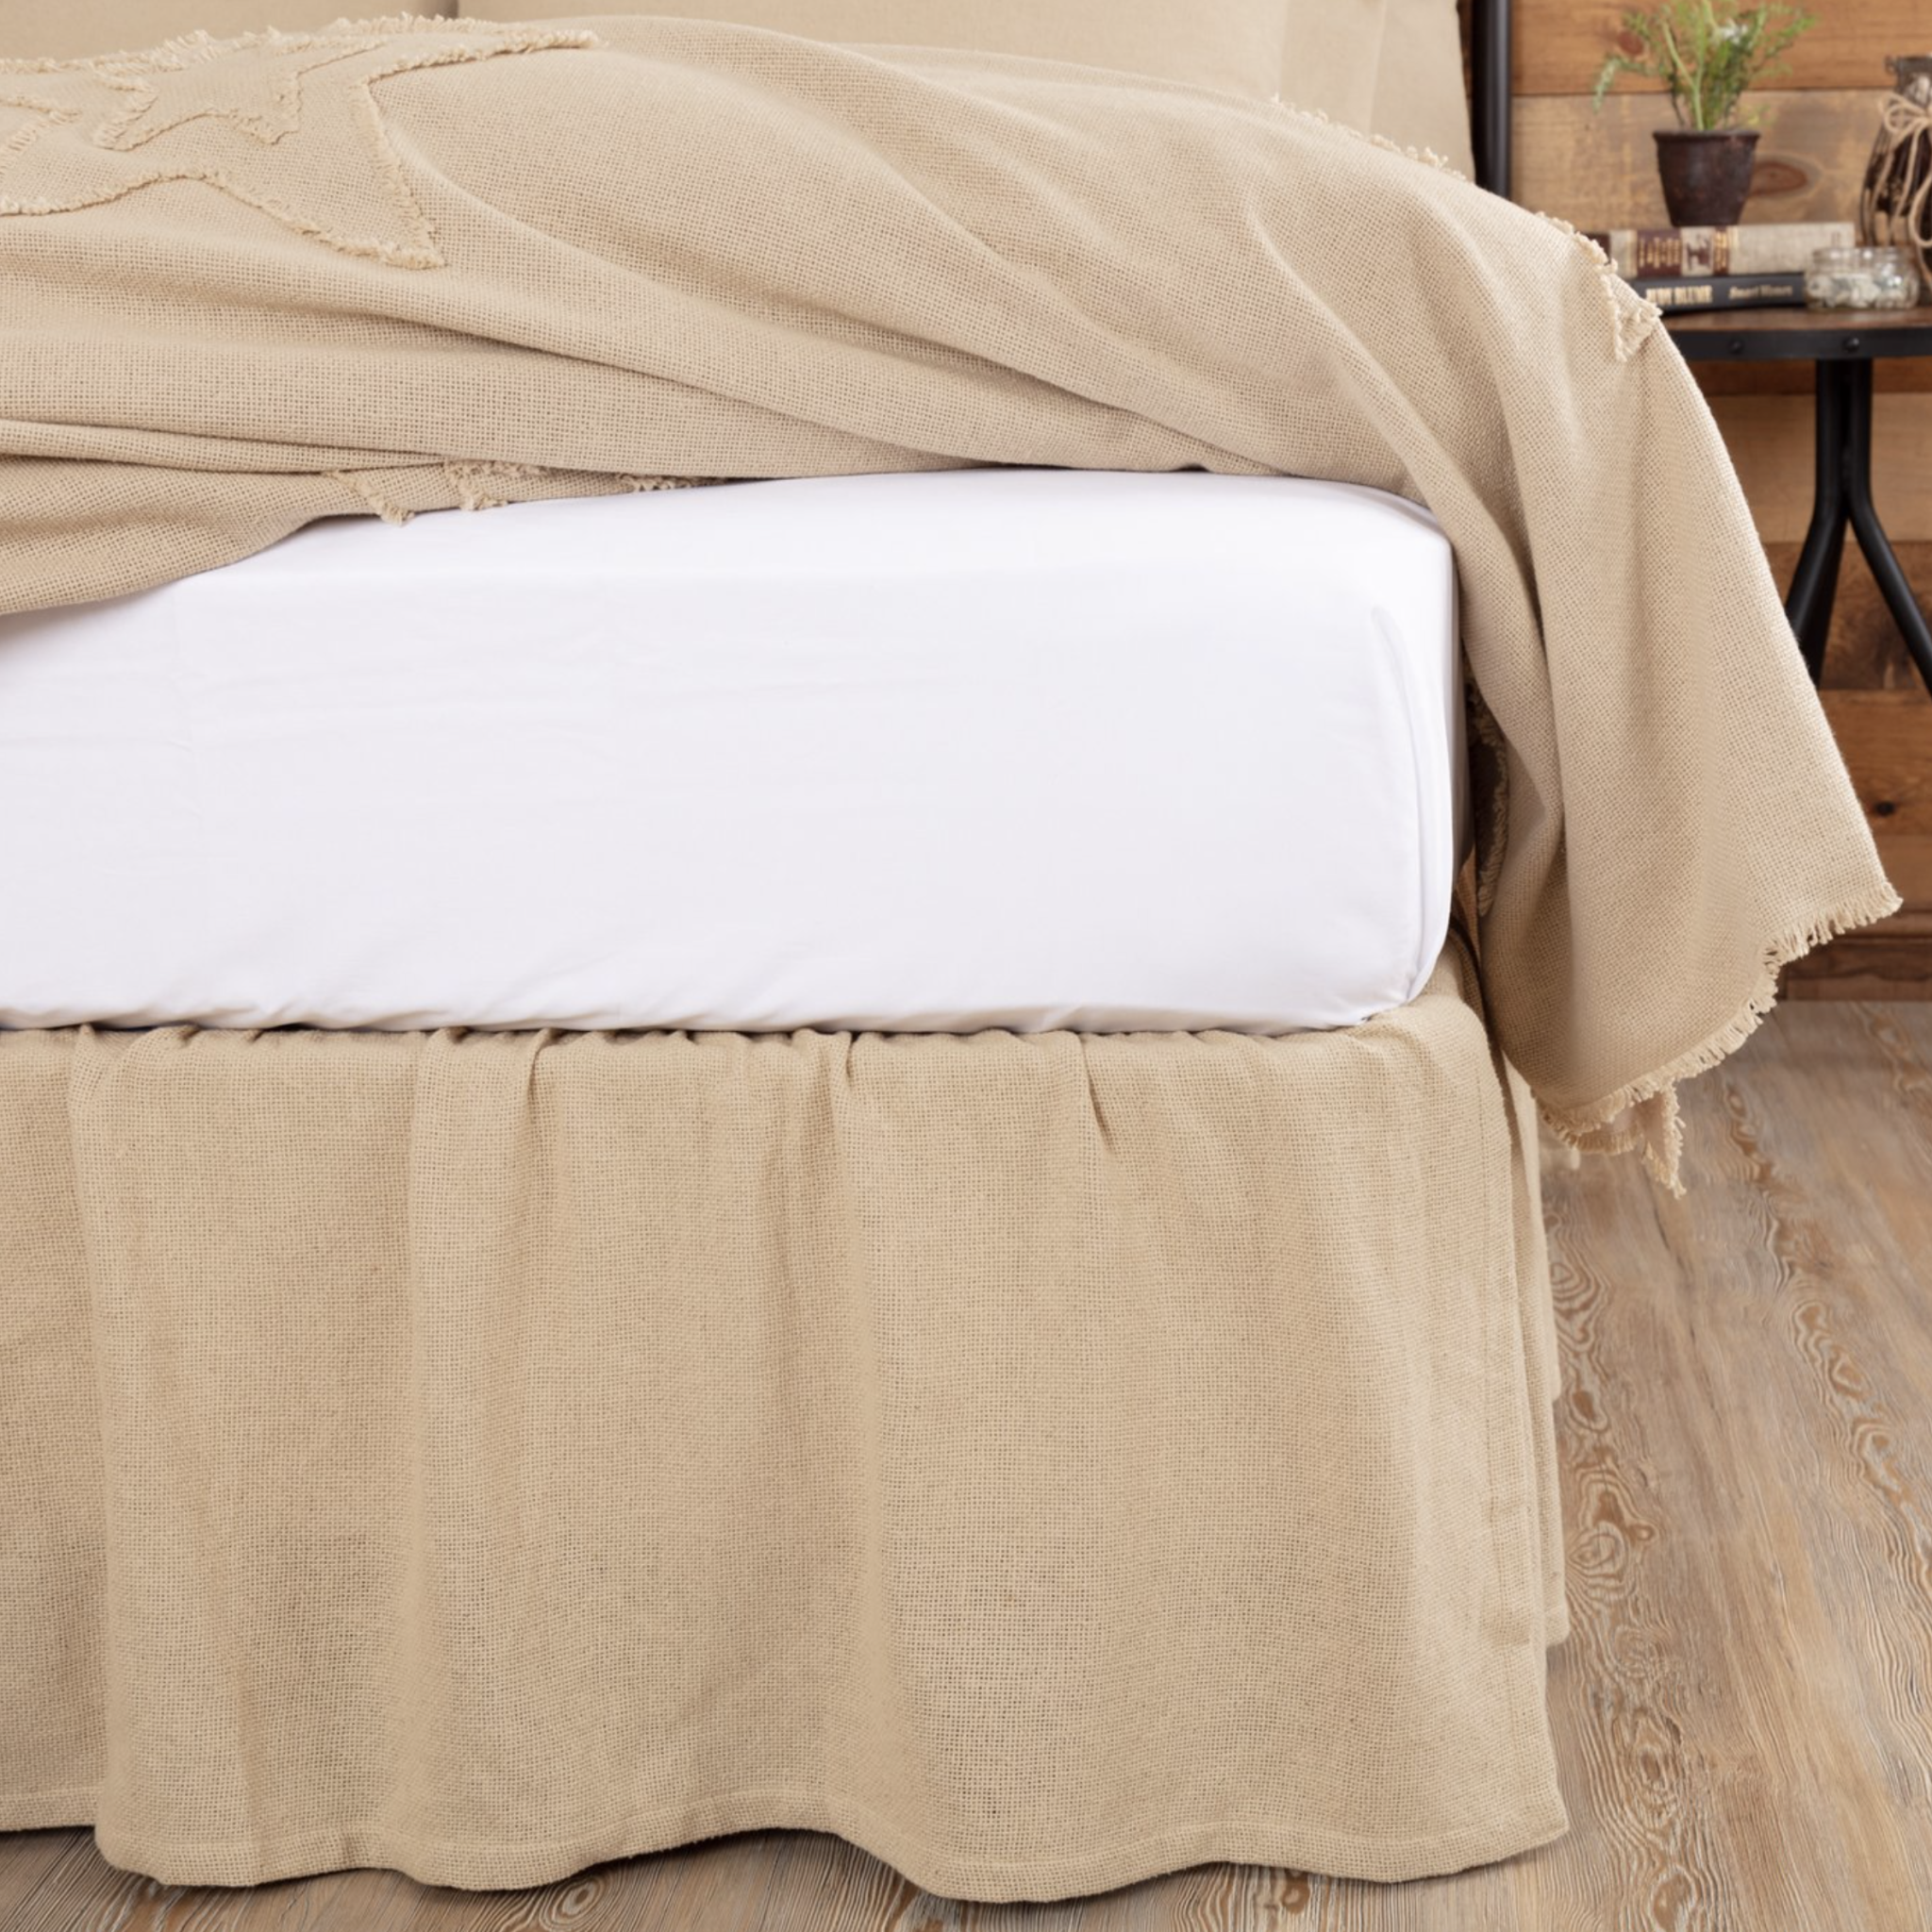 VHC Brands Burlap Vintage Ruffled Bed Skirt